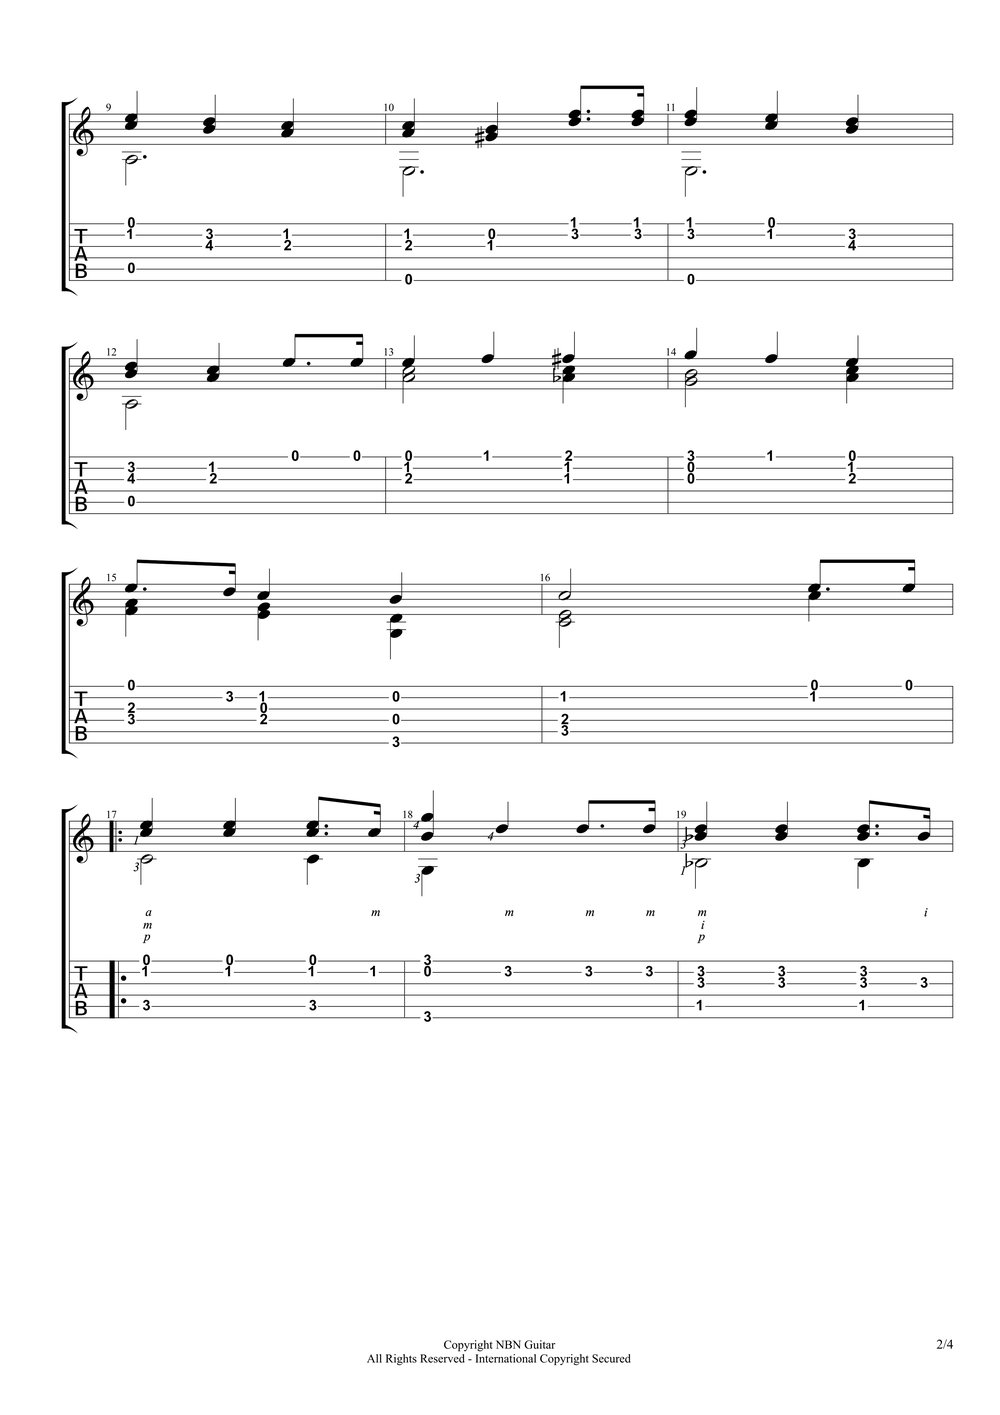 Etude No. 3, Op. 35 - Sor (Sheet Music & Tabs)-p4.jpg